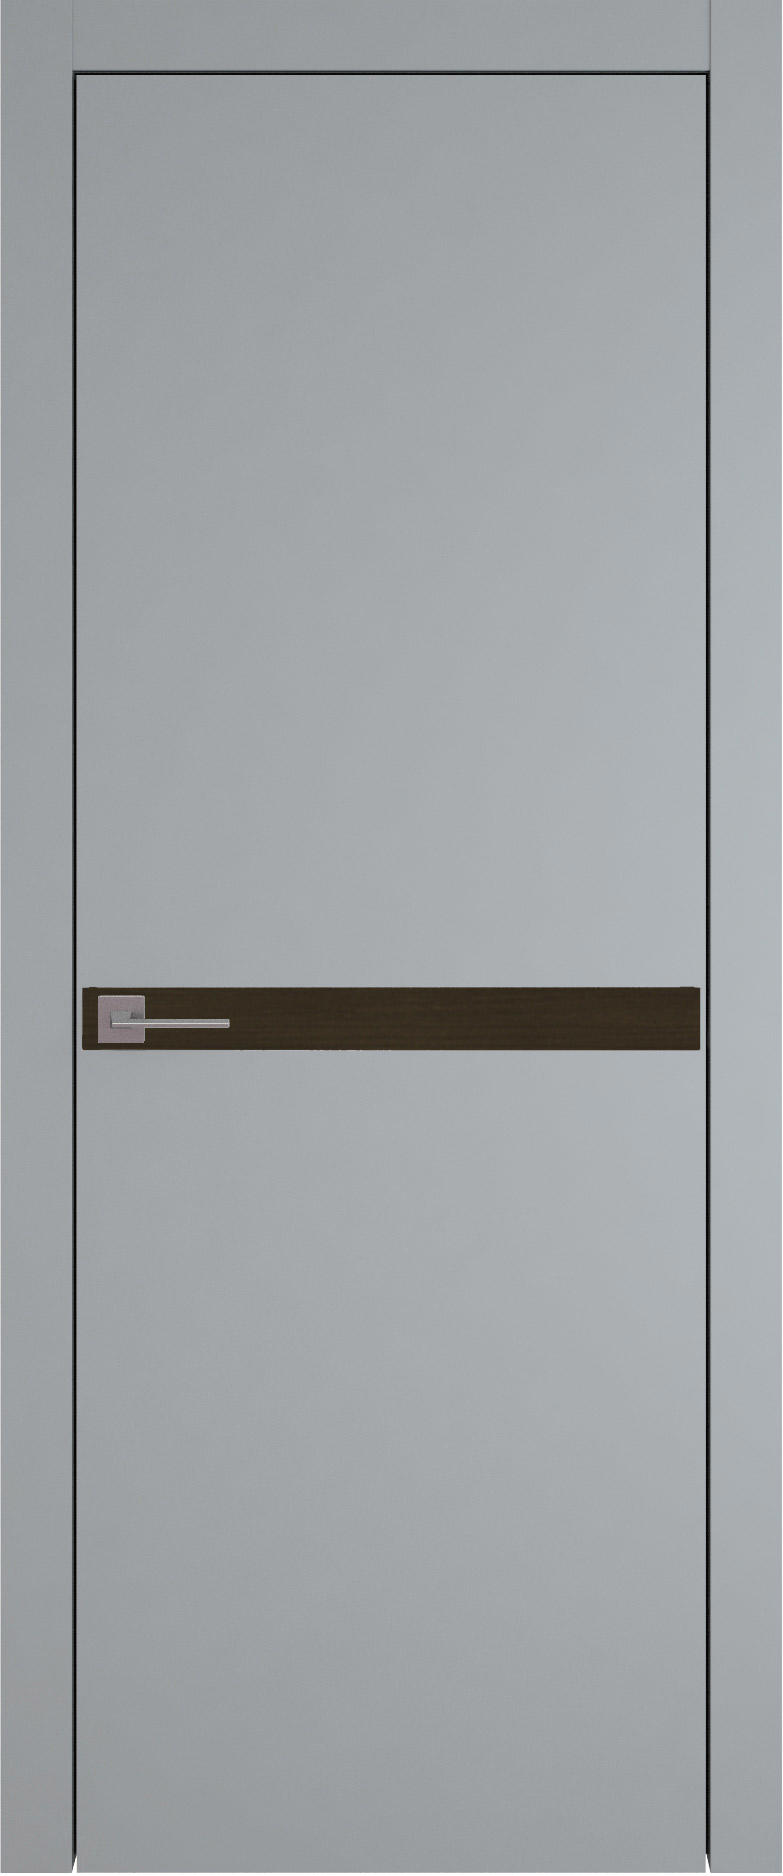 Tivoli Б-4 цвет - Серебристо-серая эмаль (RAL 7045) Без стекла (ДГ)